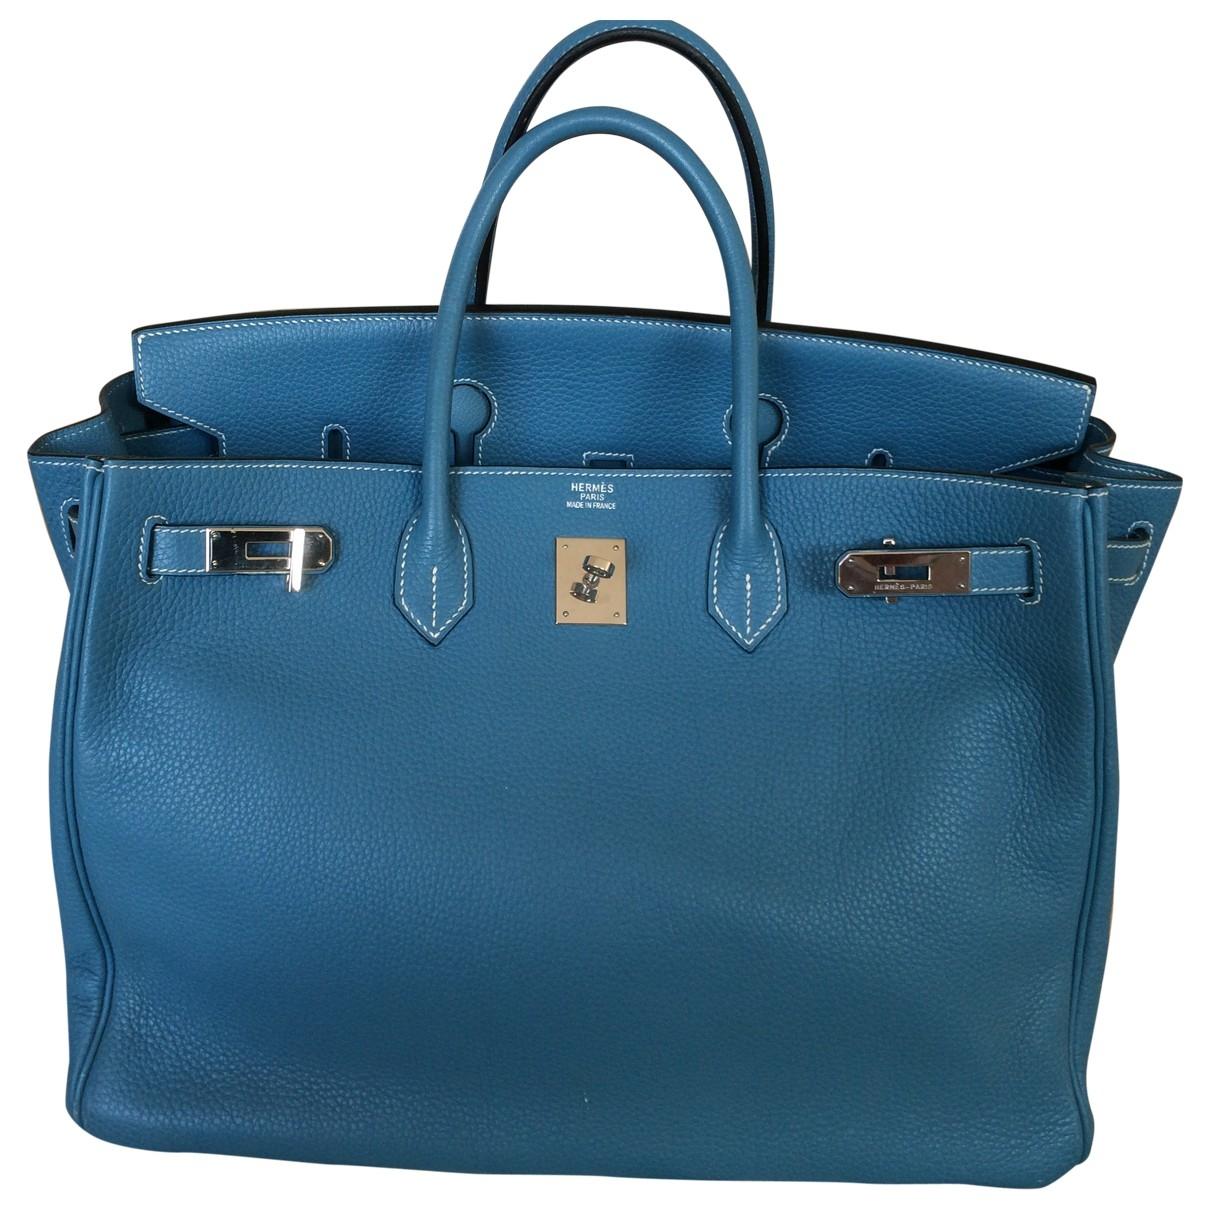 Hermes Birkin 40 Handtasche in  Blau Leder